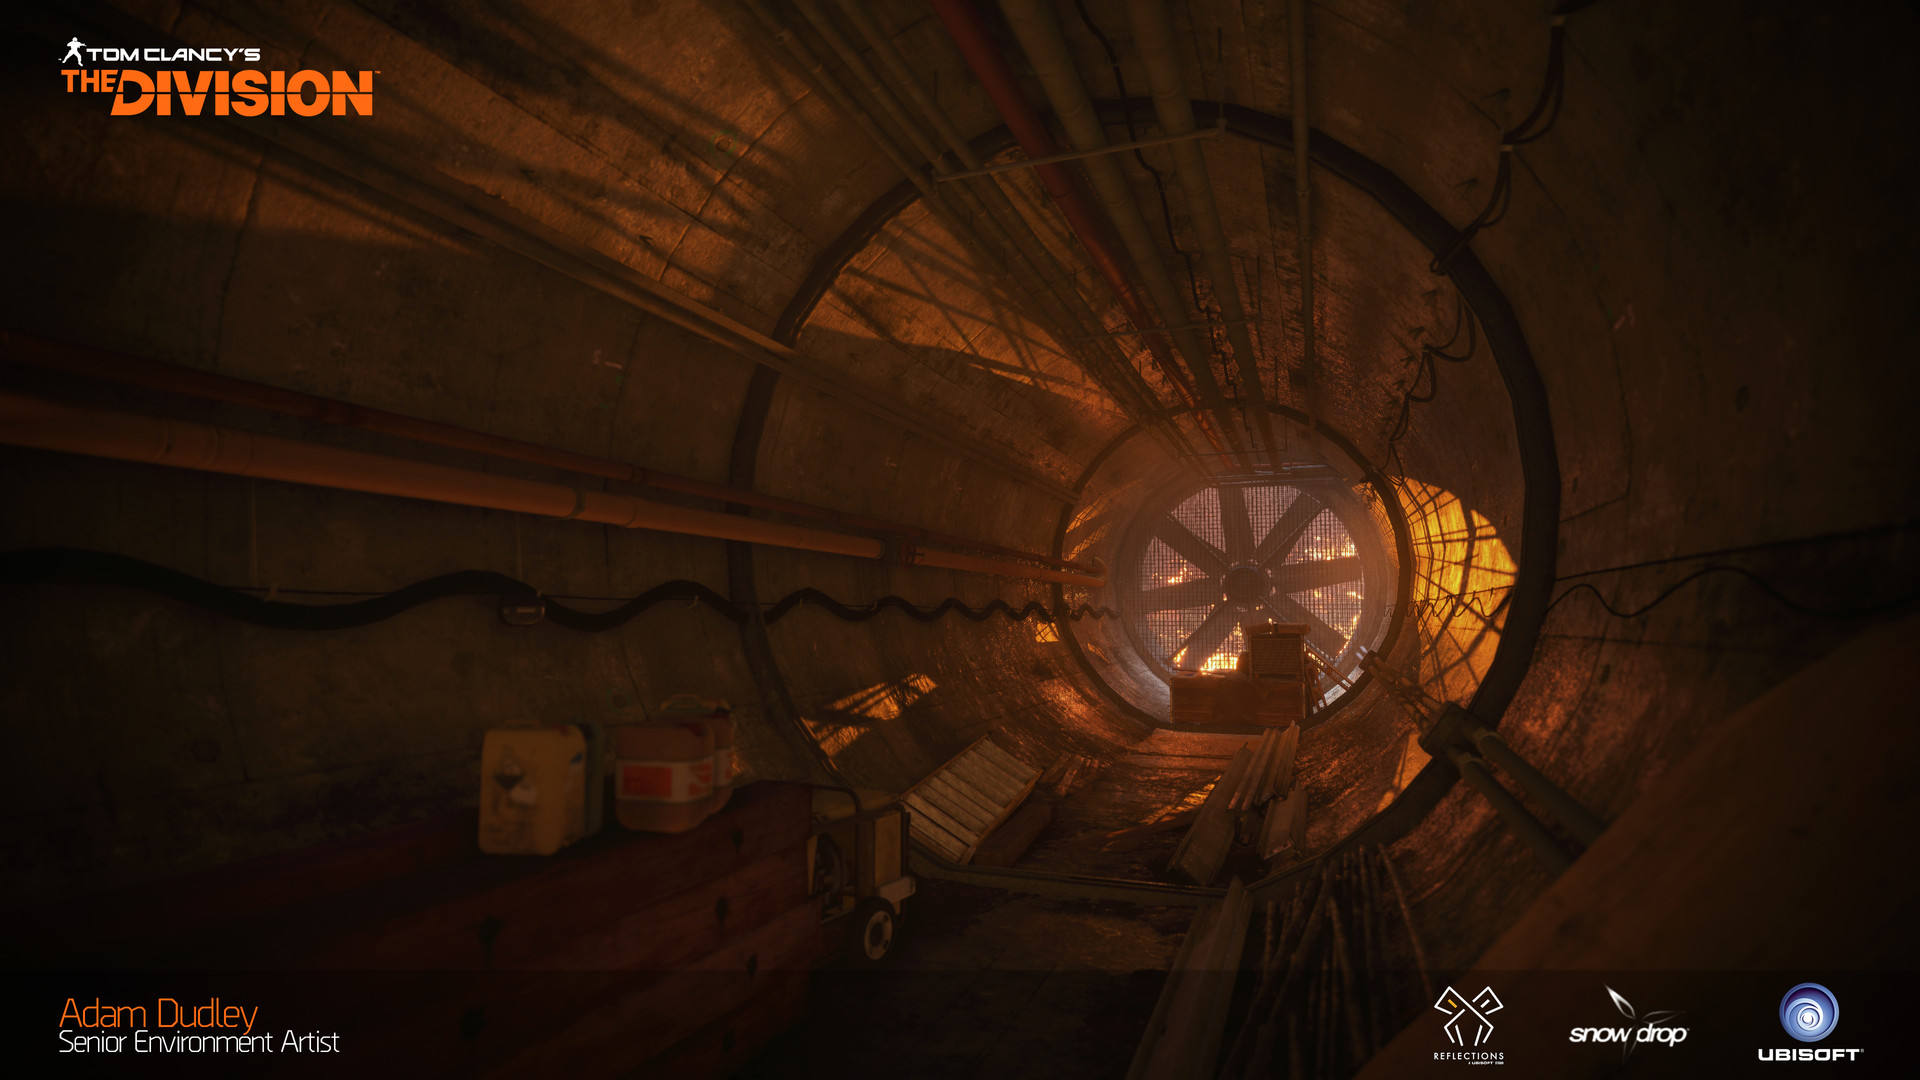 Adam dudley adudley subwaymorgue tunnelfan